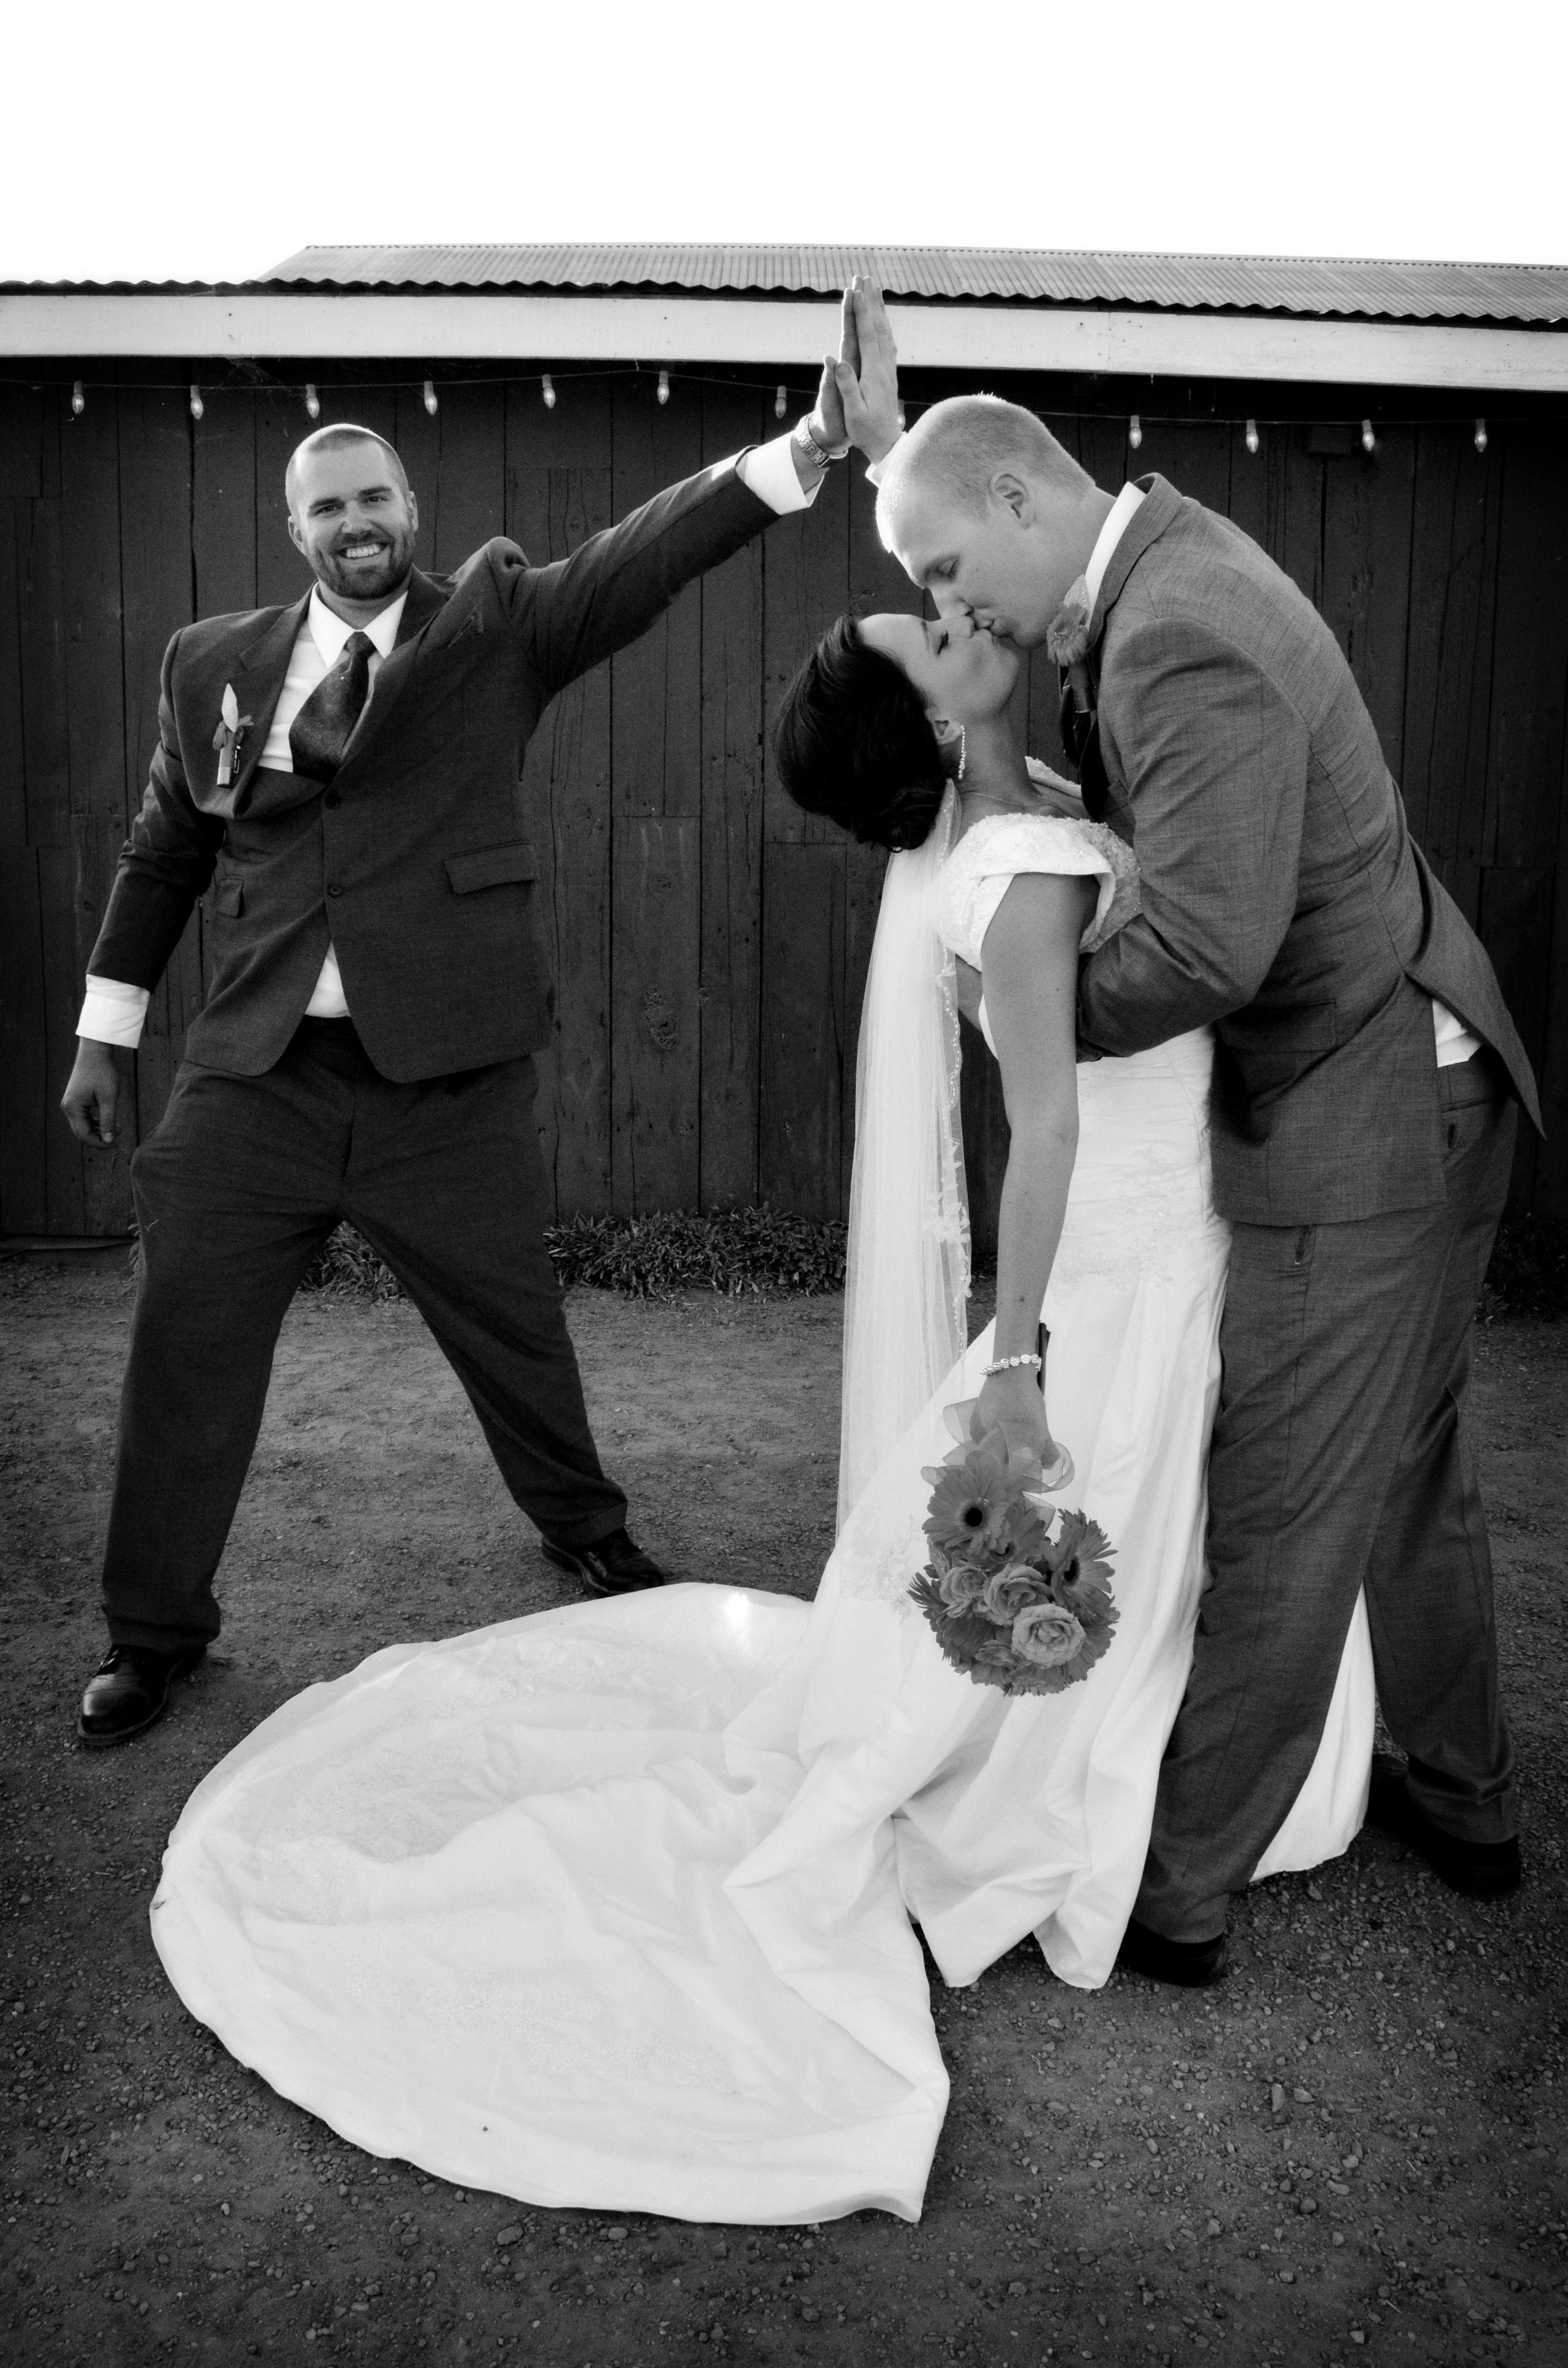 Christian wedding toasts maid of honor